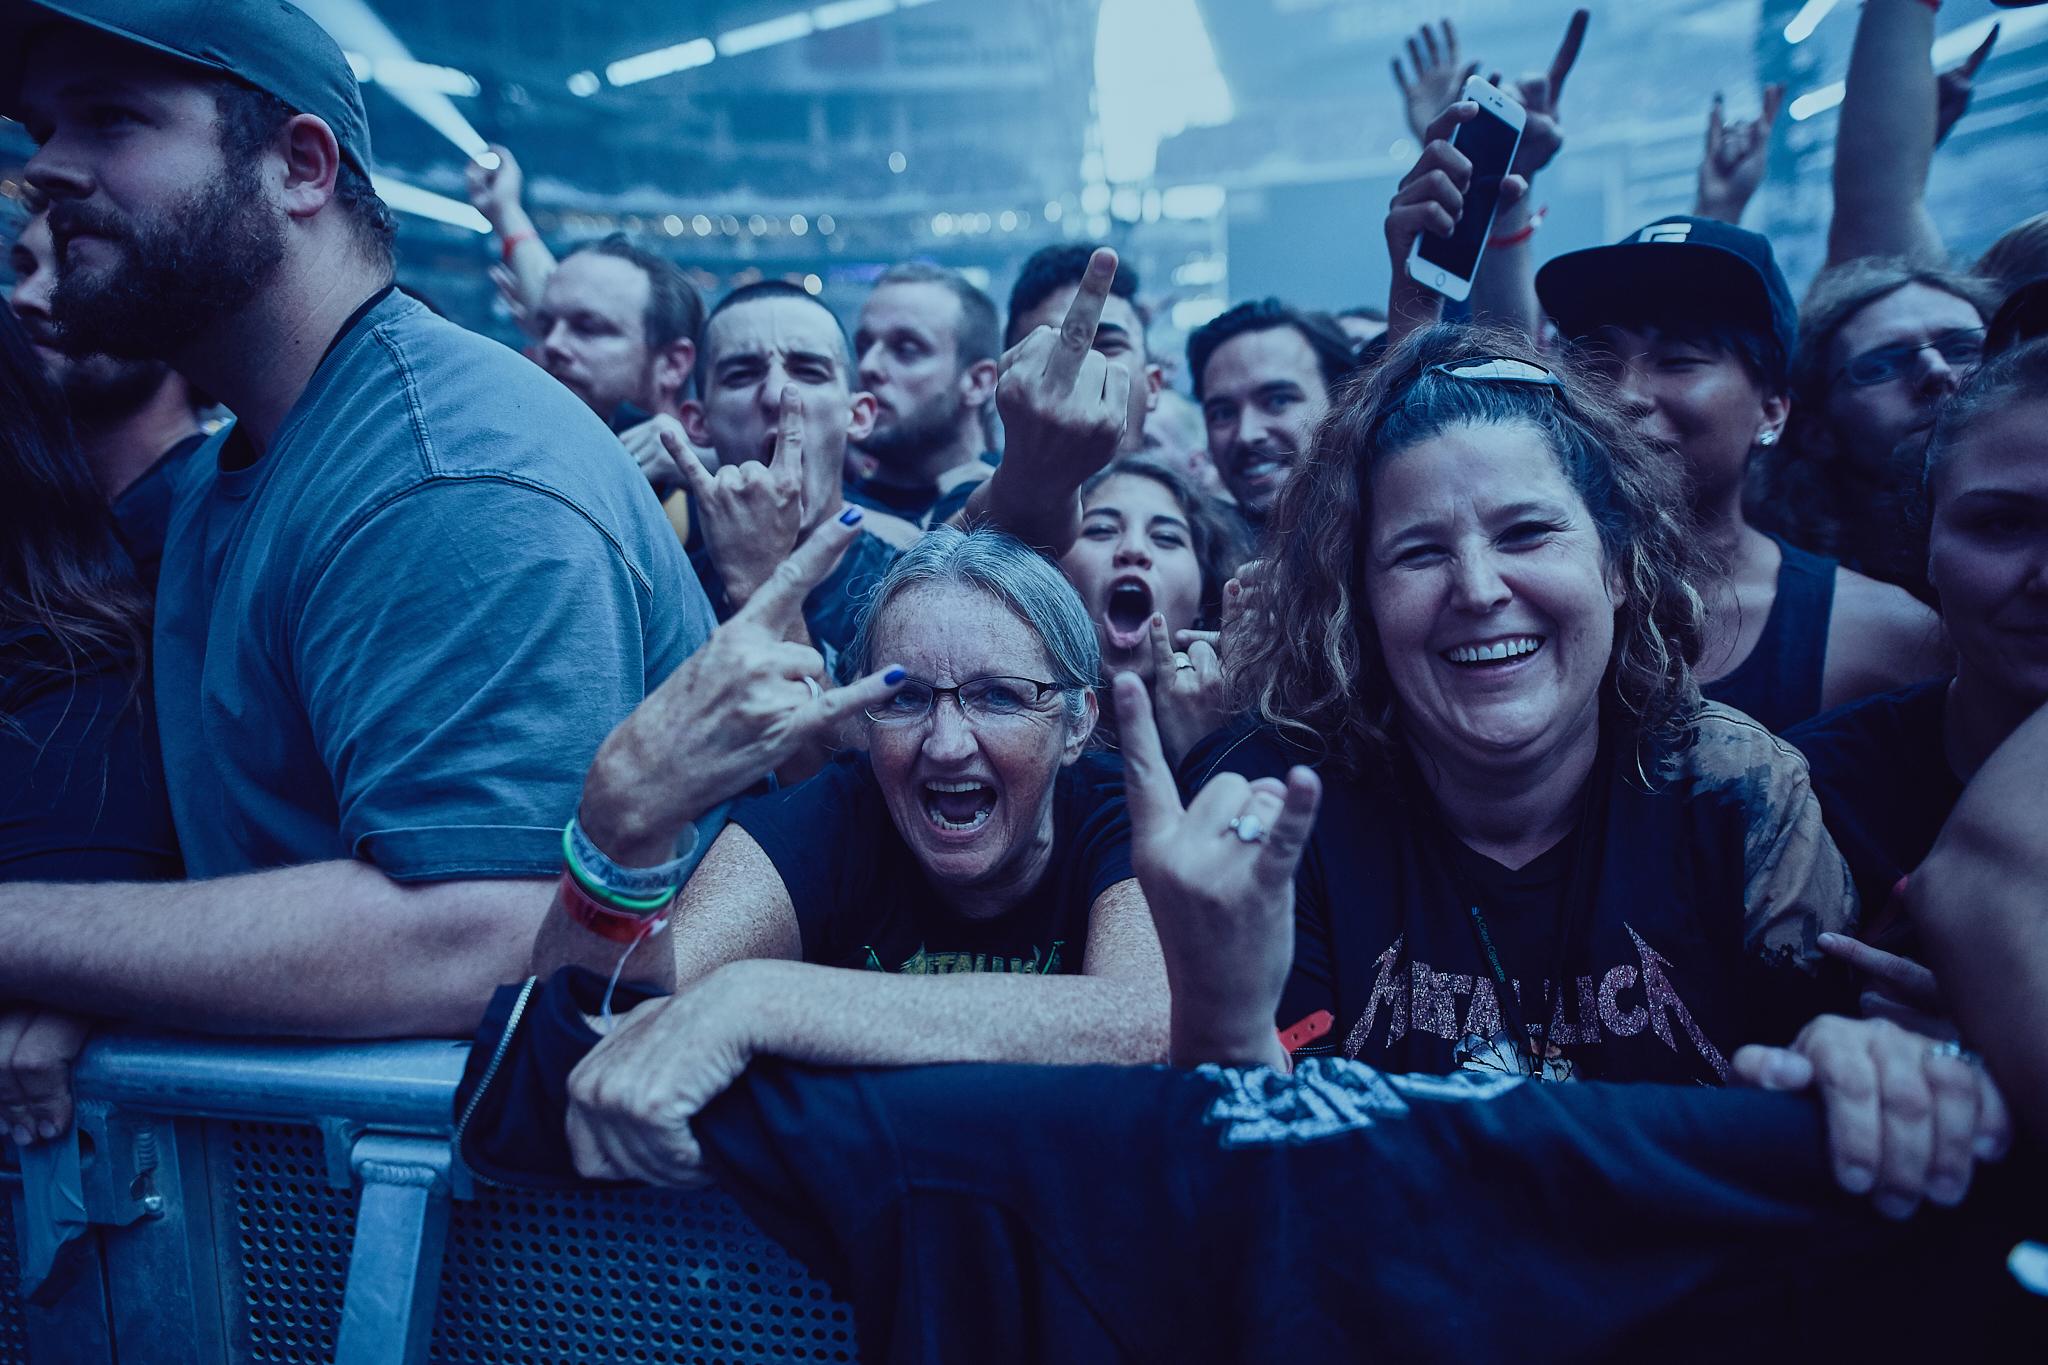 Avenged_Sevenfold_at_US_Bank_Stadium_Minneapolis_First_Rock_Show_08-20_2016_Photo_By_Joe_Lemke_012.jpg